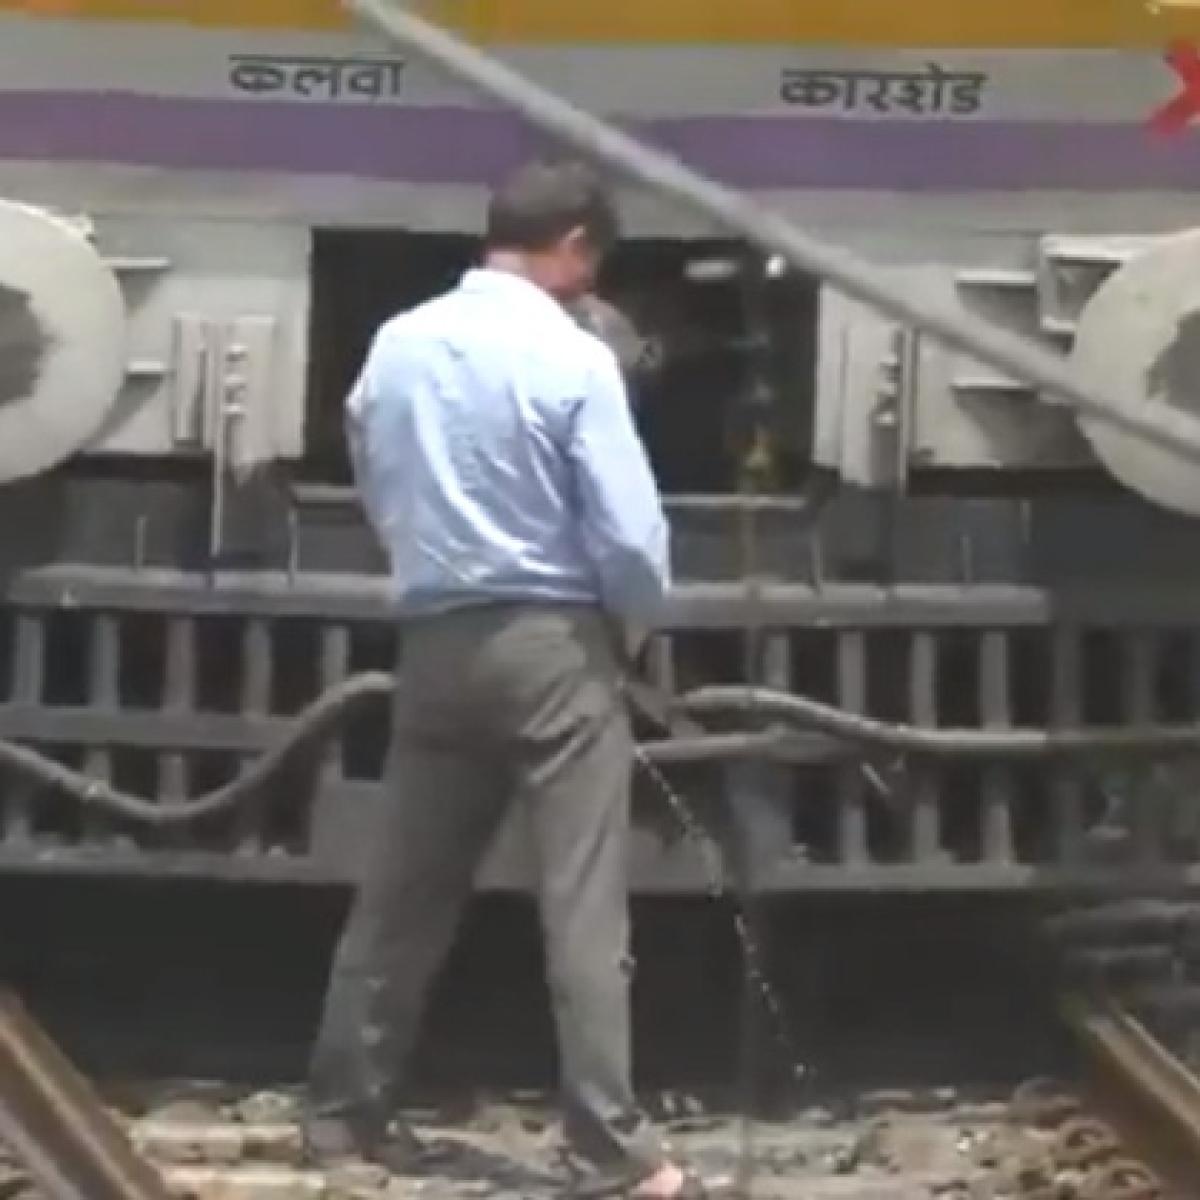 Mumbai loo-cal: Central Railway motorman halts local train between Ambernath and Ulhasnagar to pee on track, video goes viral